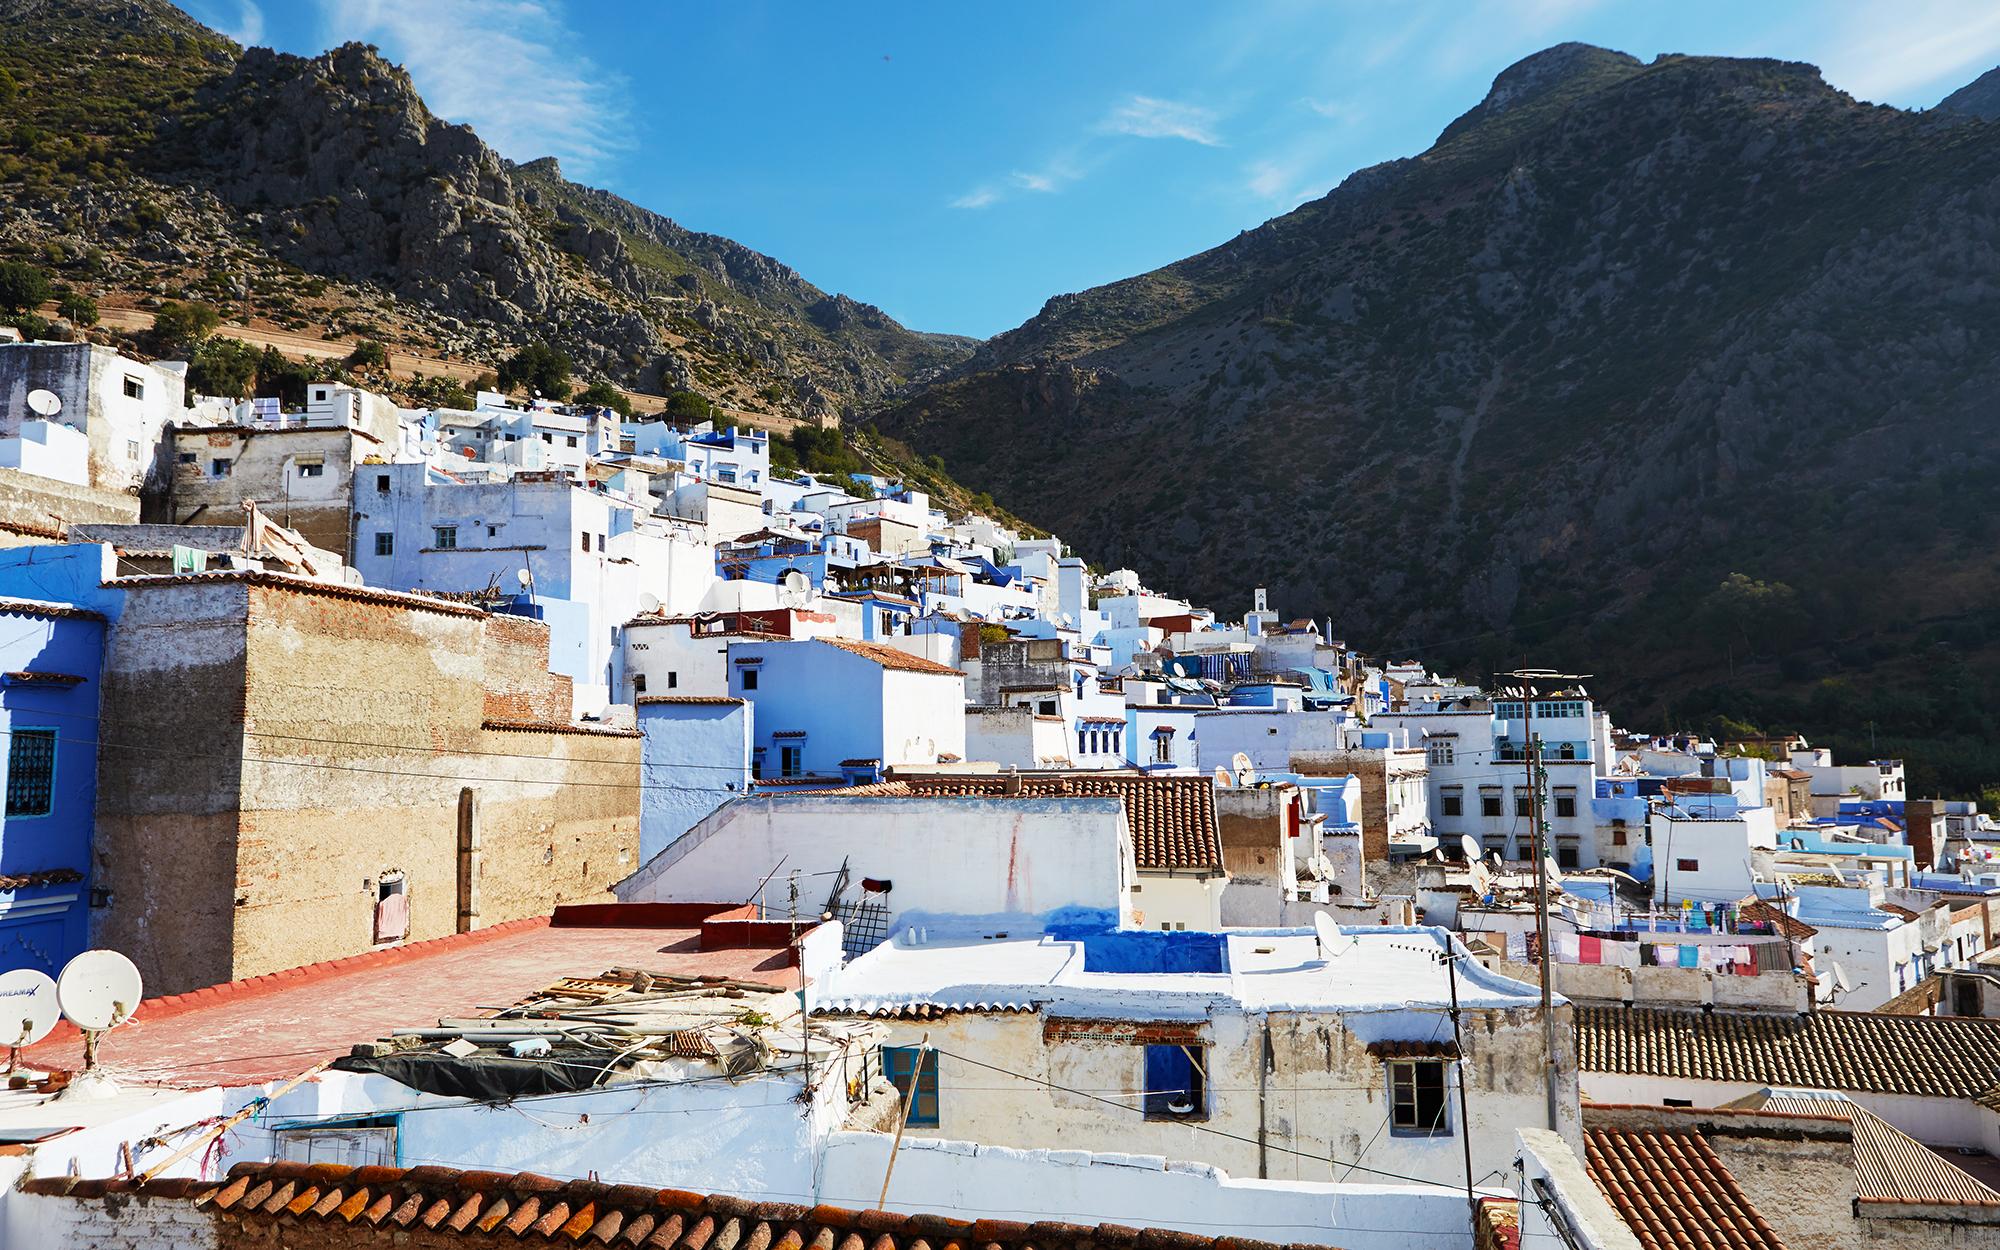 Anna_McKerrow_Morocco_01.jpg